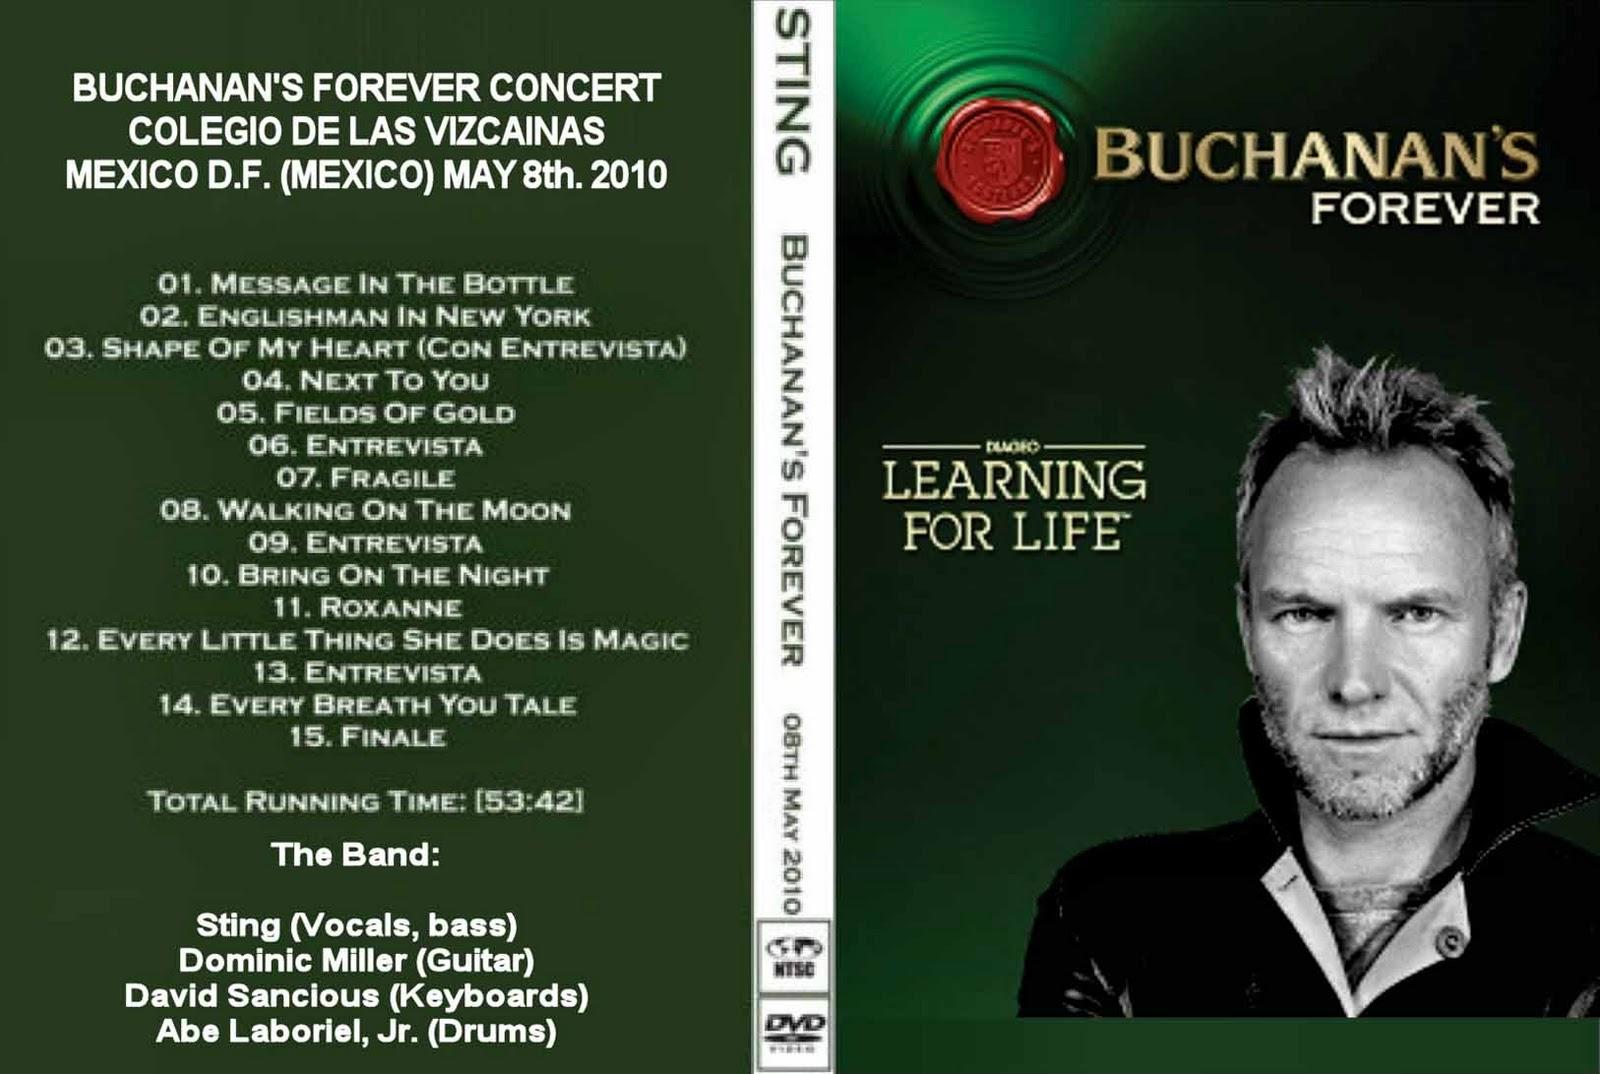 http://2.bp.blogspot.com/-xqrRoi5JZEs/Tq59H_XFLdI/AAAAAAAAEUo/_NFfoedLHio/s1600/DVD+Cover+-+Sting+-+Live+In+Mexico+City%252C+Mexico+2010.jpg